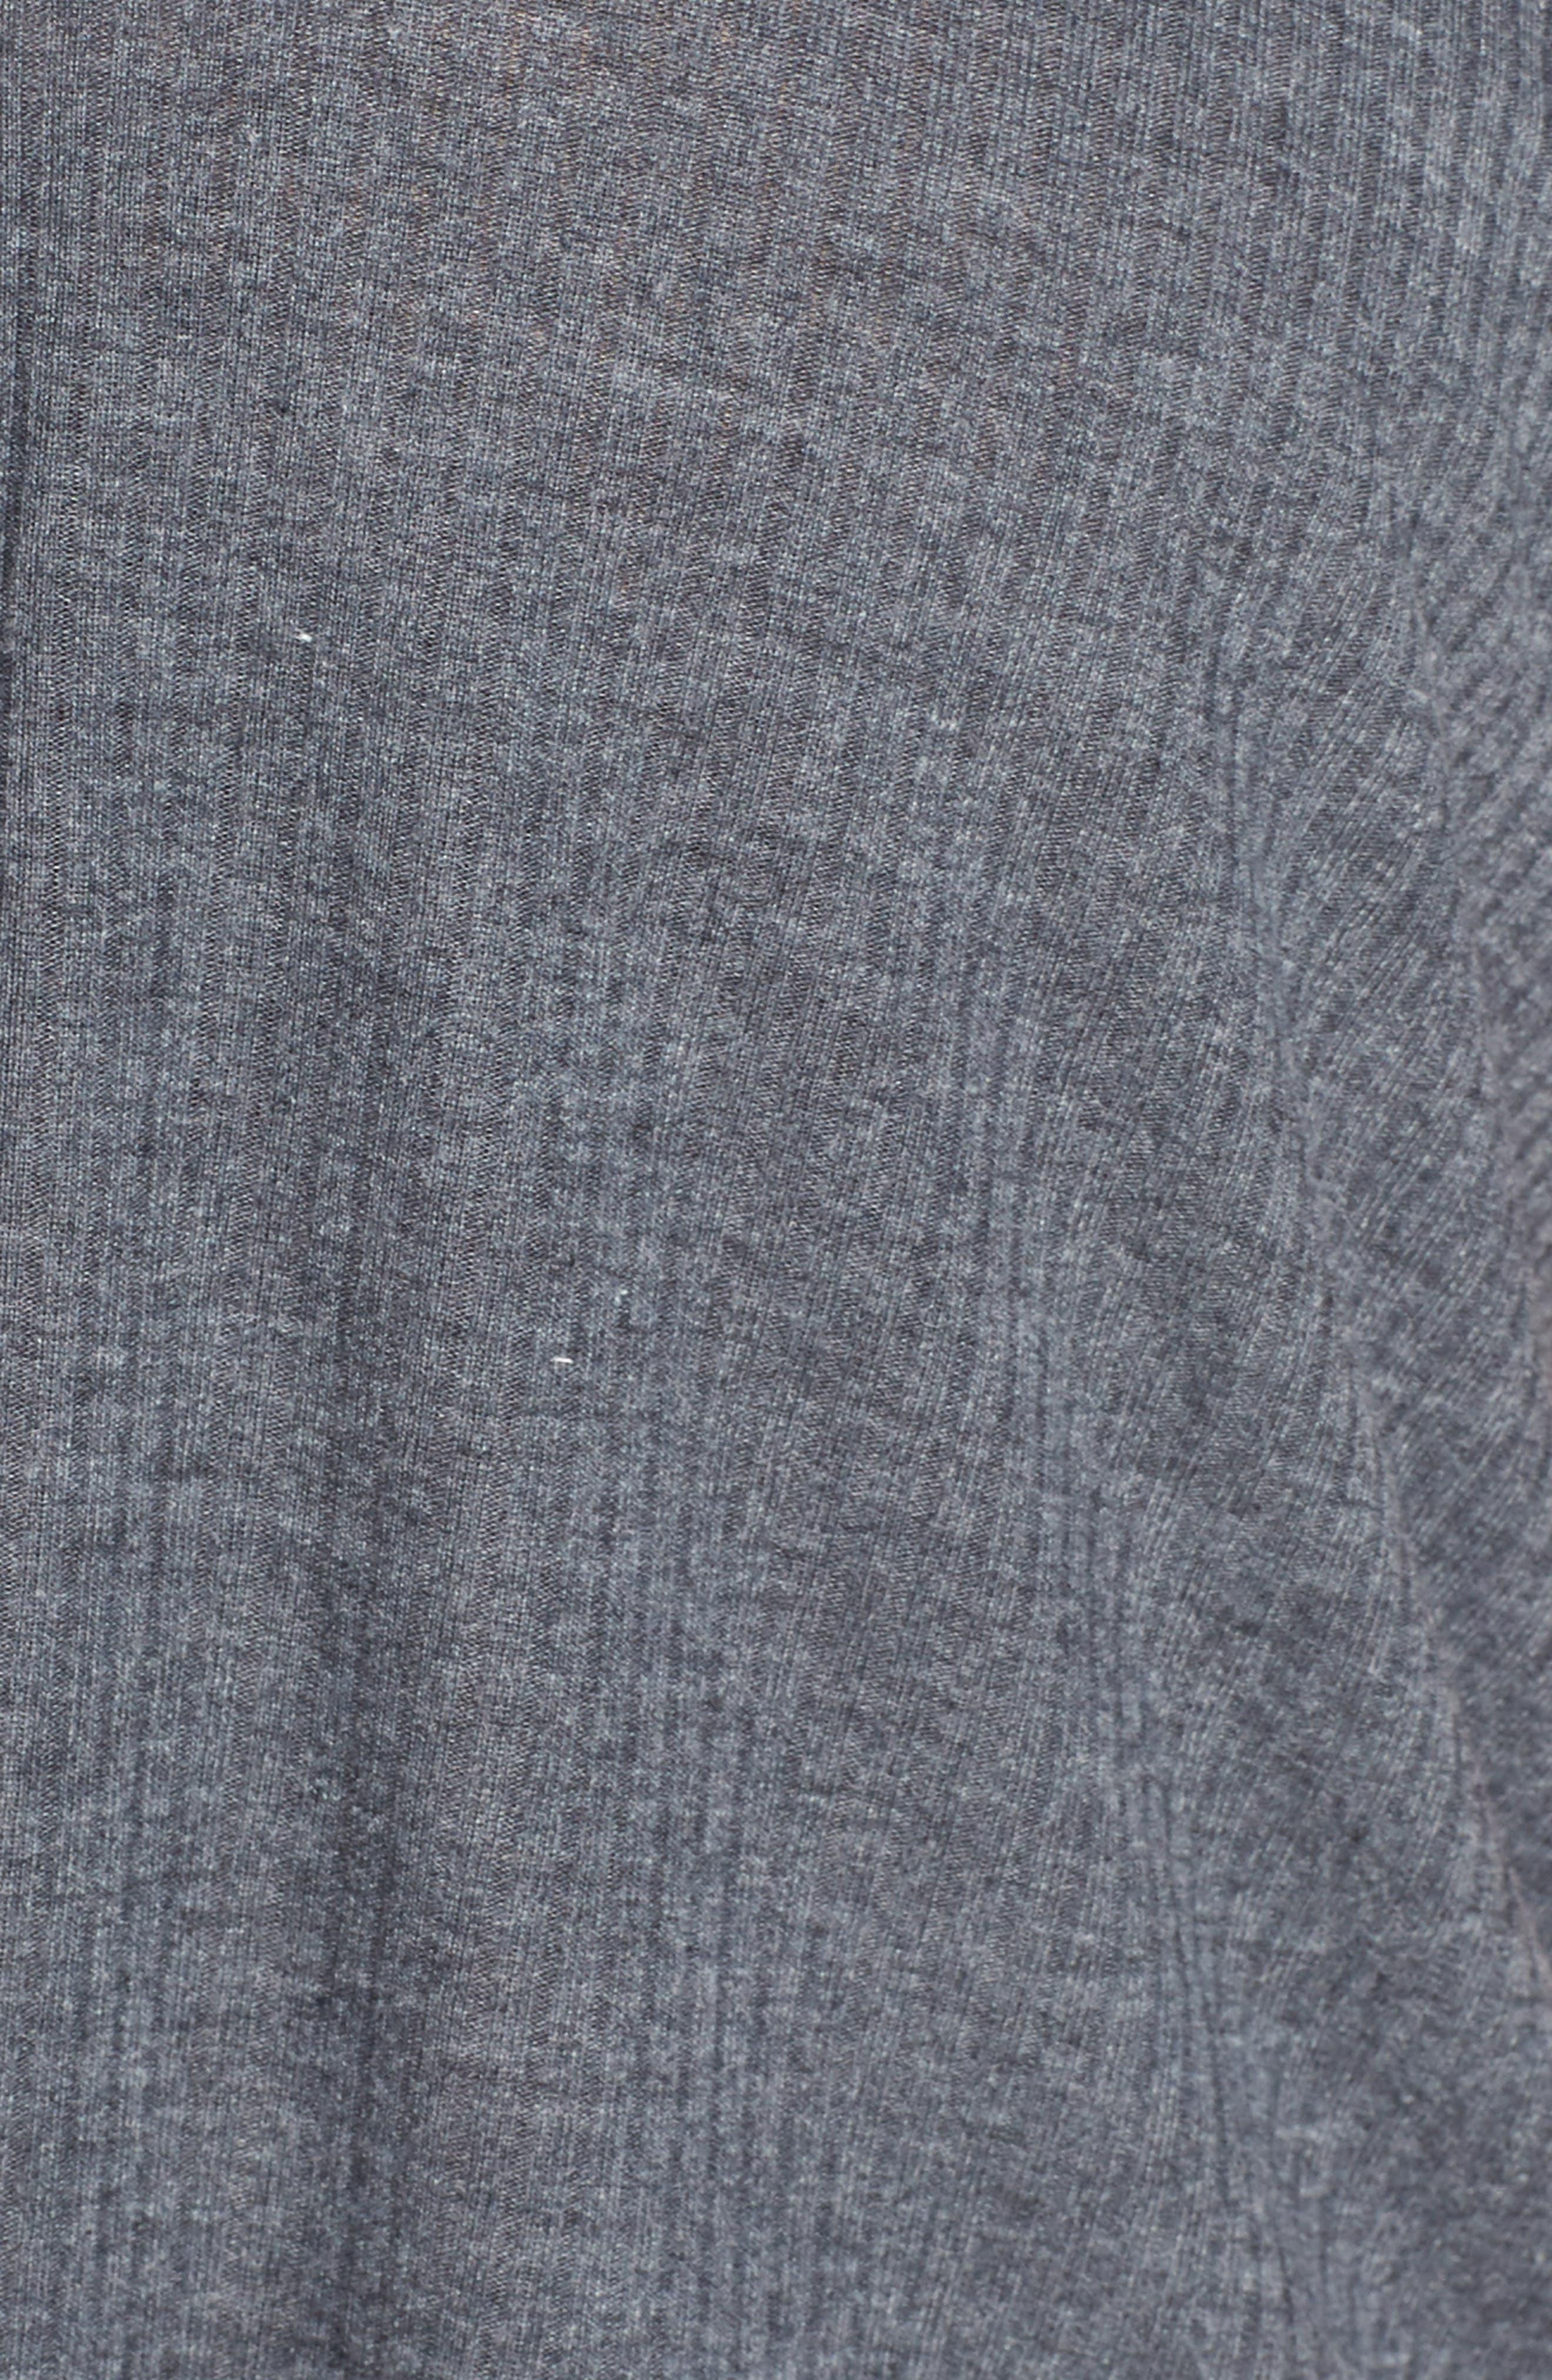 Button Front Knot Hem Tee,                             Alternate thumbnail 5, color,                             GREY MEDIUM CHARCOAL HEATHER